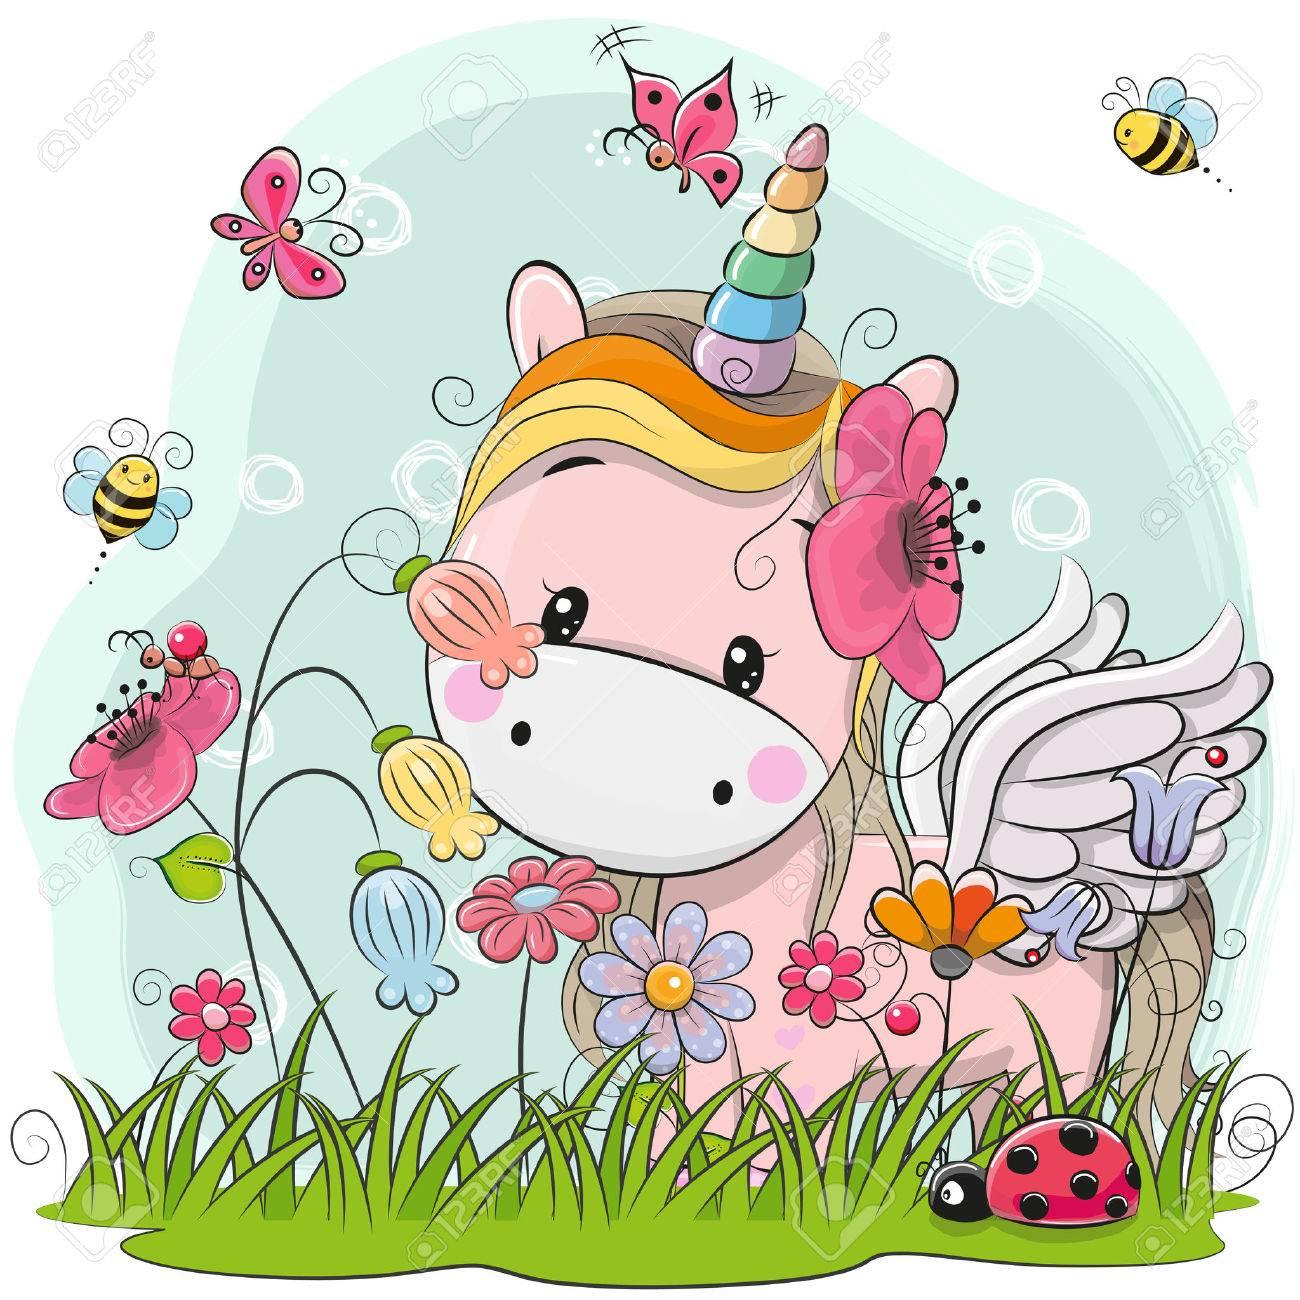 Cute Cartoon Kitt Unicorn on a meadow with flowers and butterflies - 85423967